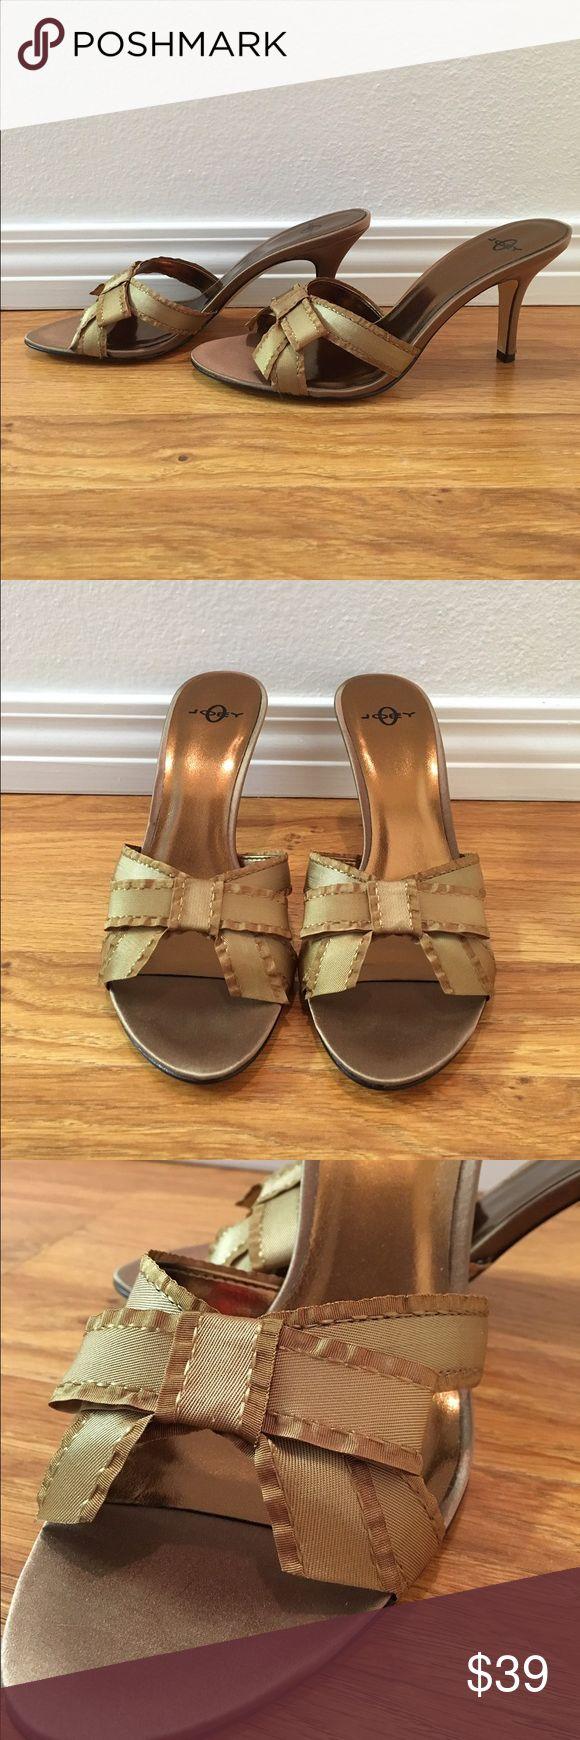 "N E W ⭐️ L I S T I N G Joey O Gold Peep Toe Heels Super sassy Joey O gold metallic peep toe slip on heels. Cute front bow detail. 3.5"" heel. ⚡️NO TRADES PLEASE⚡️ Joey O Shoes Heels"